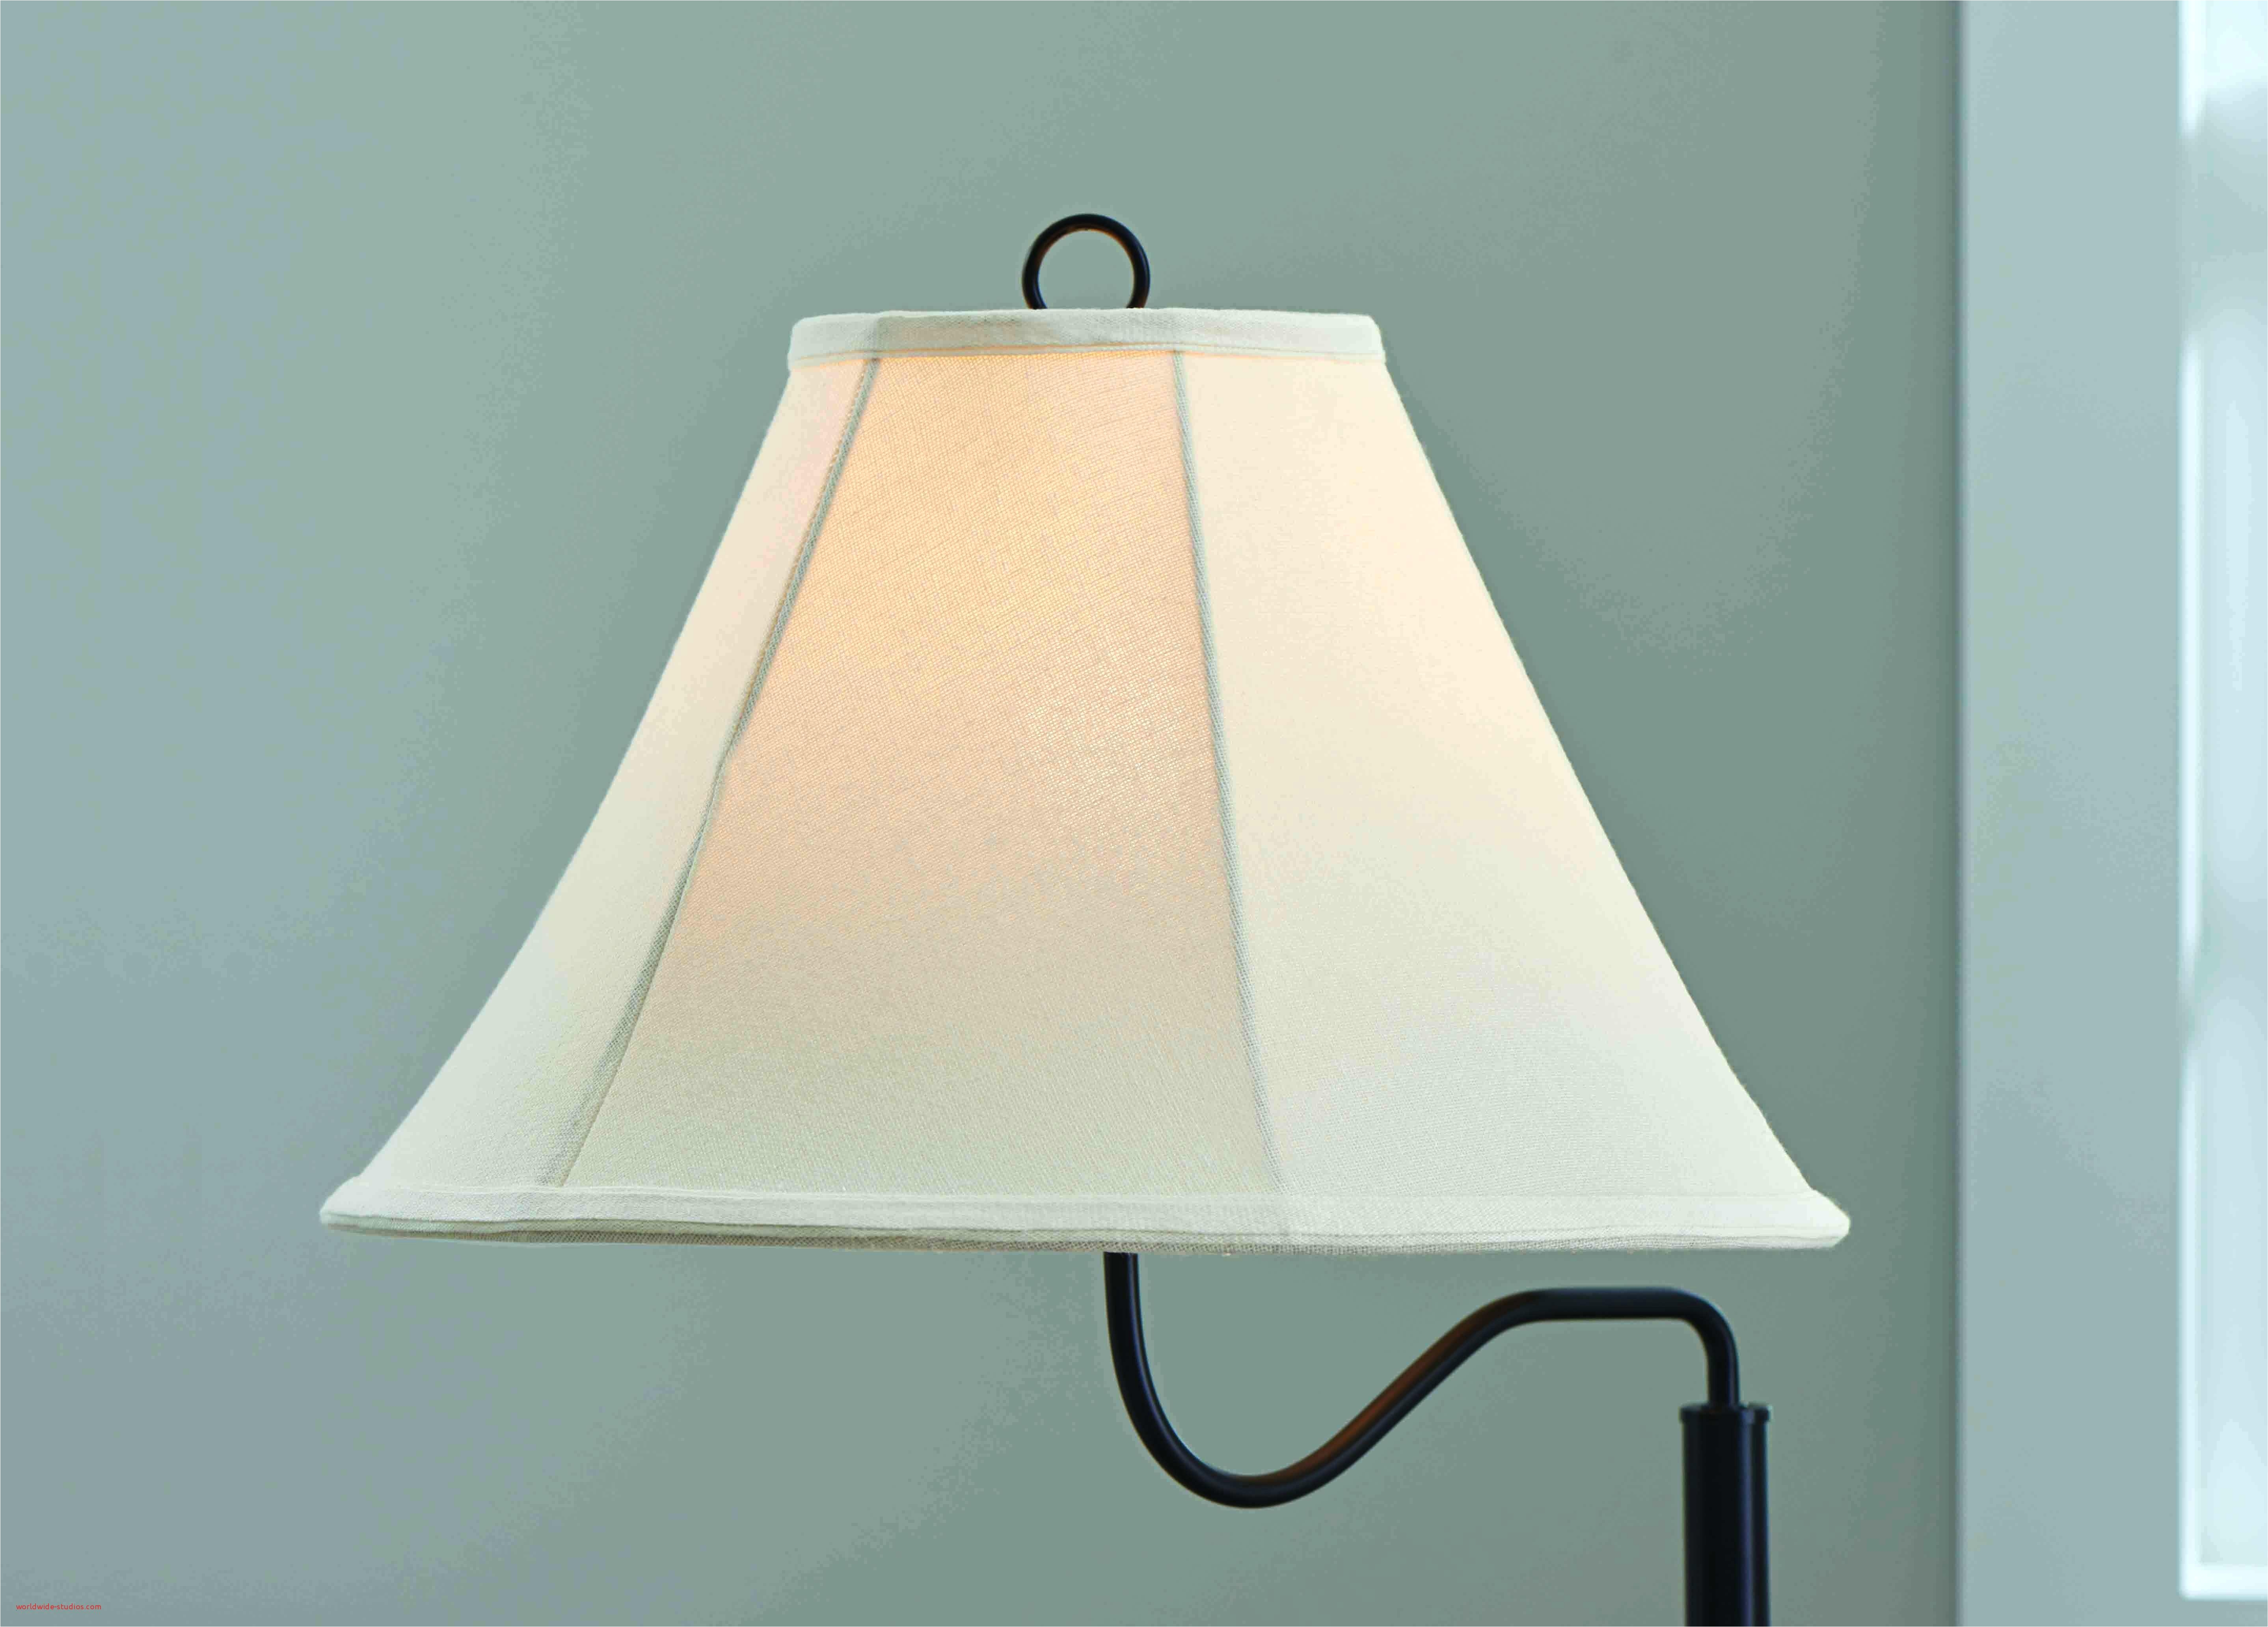 Homemade Pvc Lamp Post Awesome Of Diy solar Light Projects Pics Artsvisuelscaribeens Com